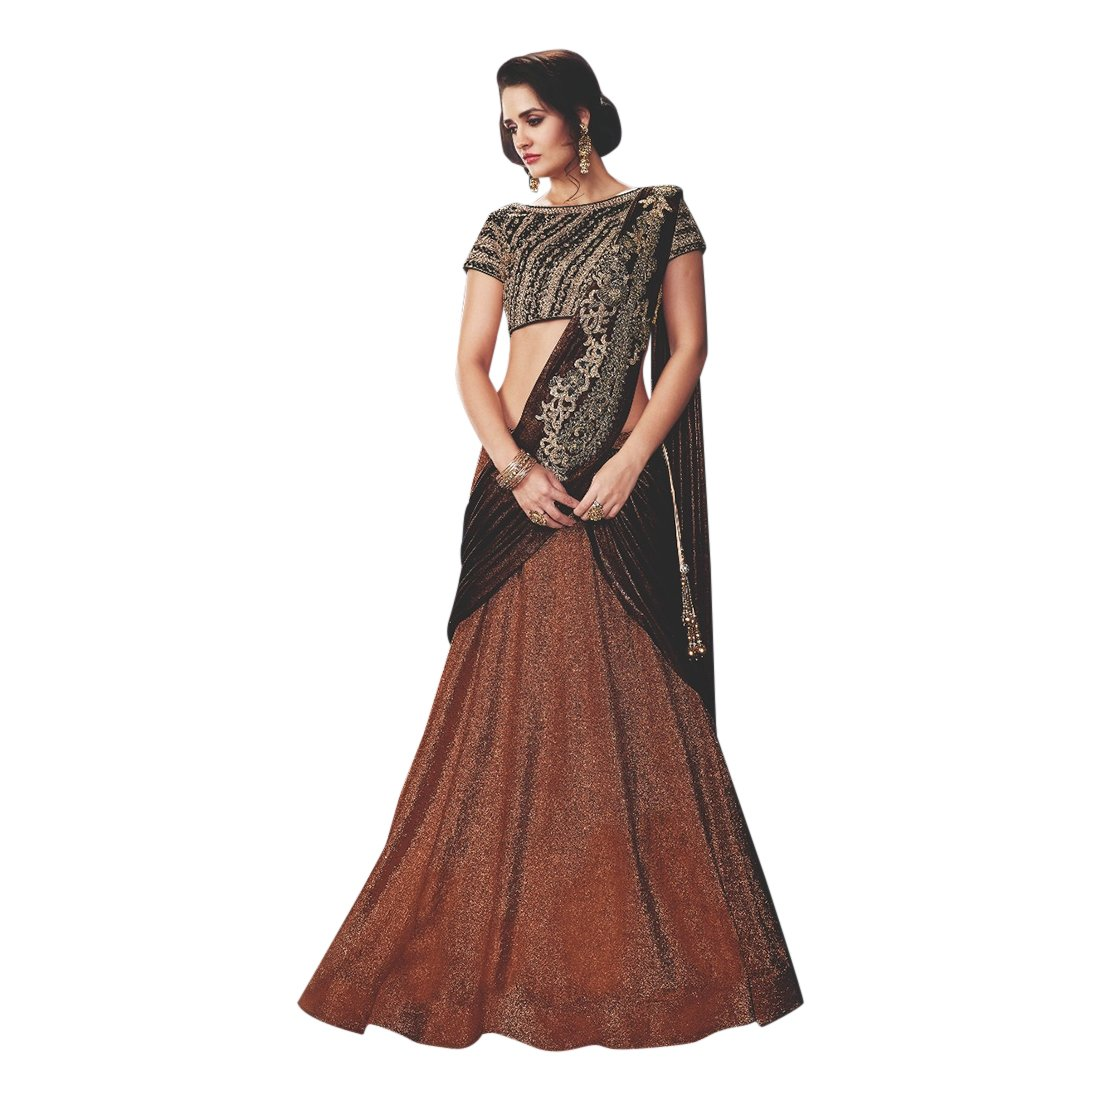 New Arrival Wedding Bollywood Designer Stylish Lehenga Choli Dupatta Custom to Measure Muslim Eid 2521